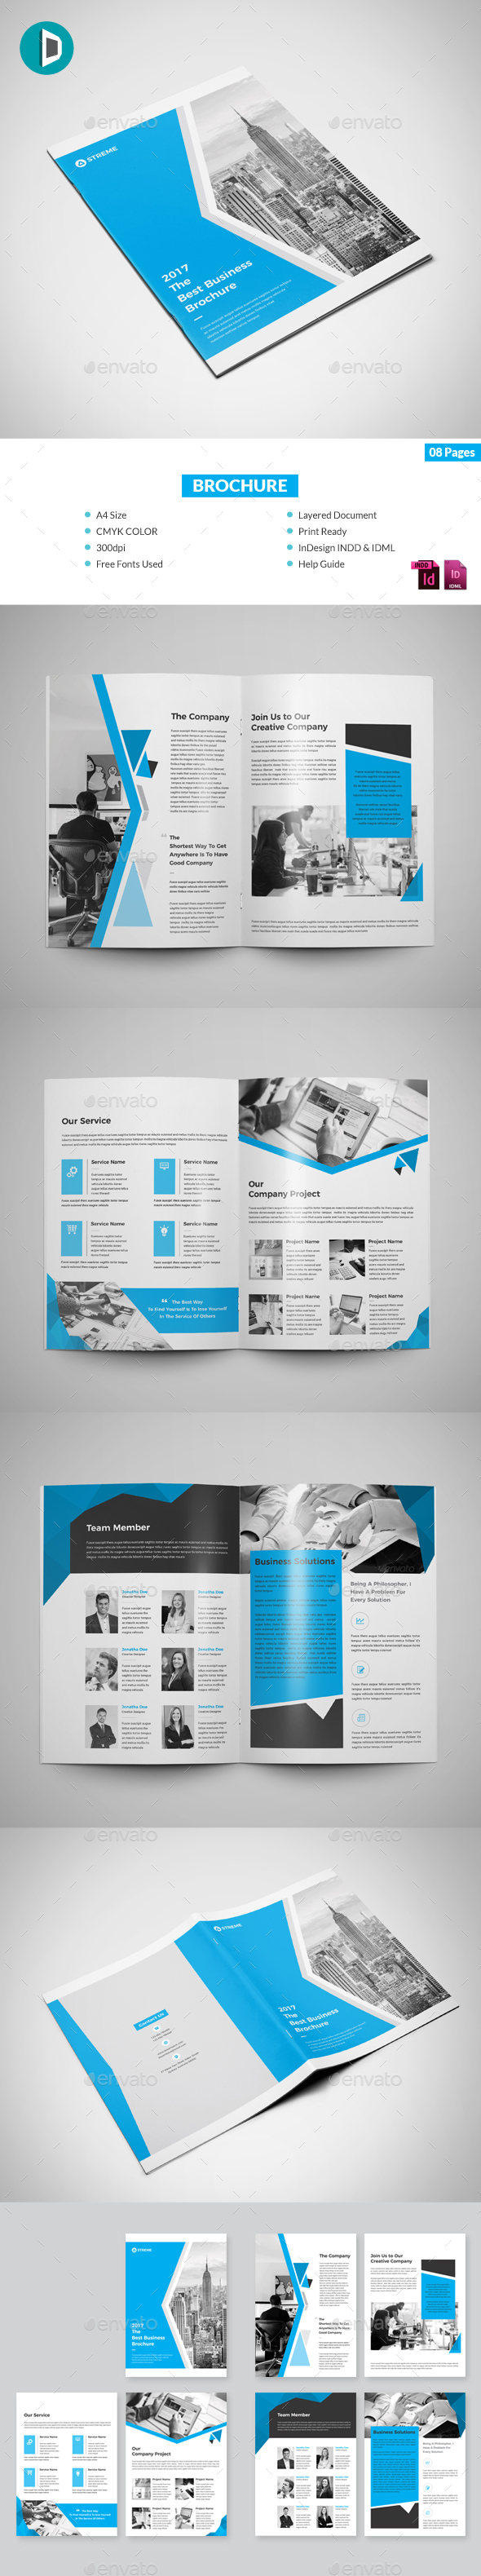 GraphicRiver 8 Page Brochure 20777533